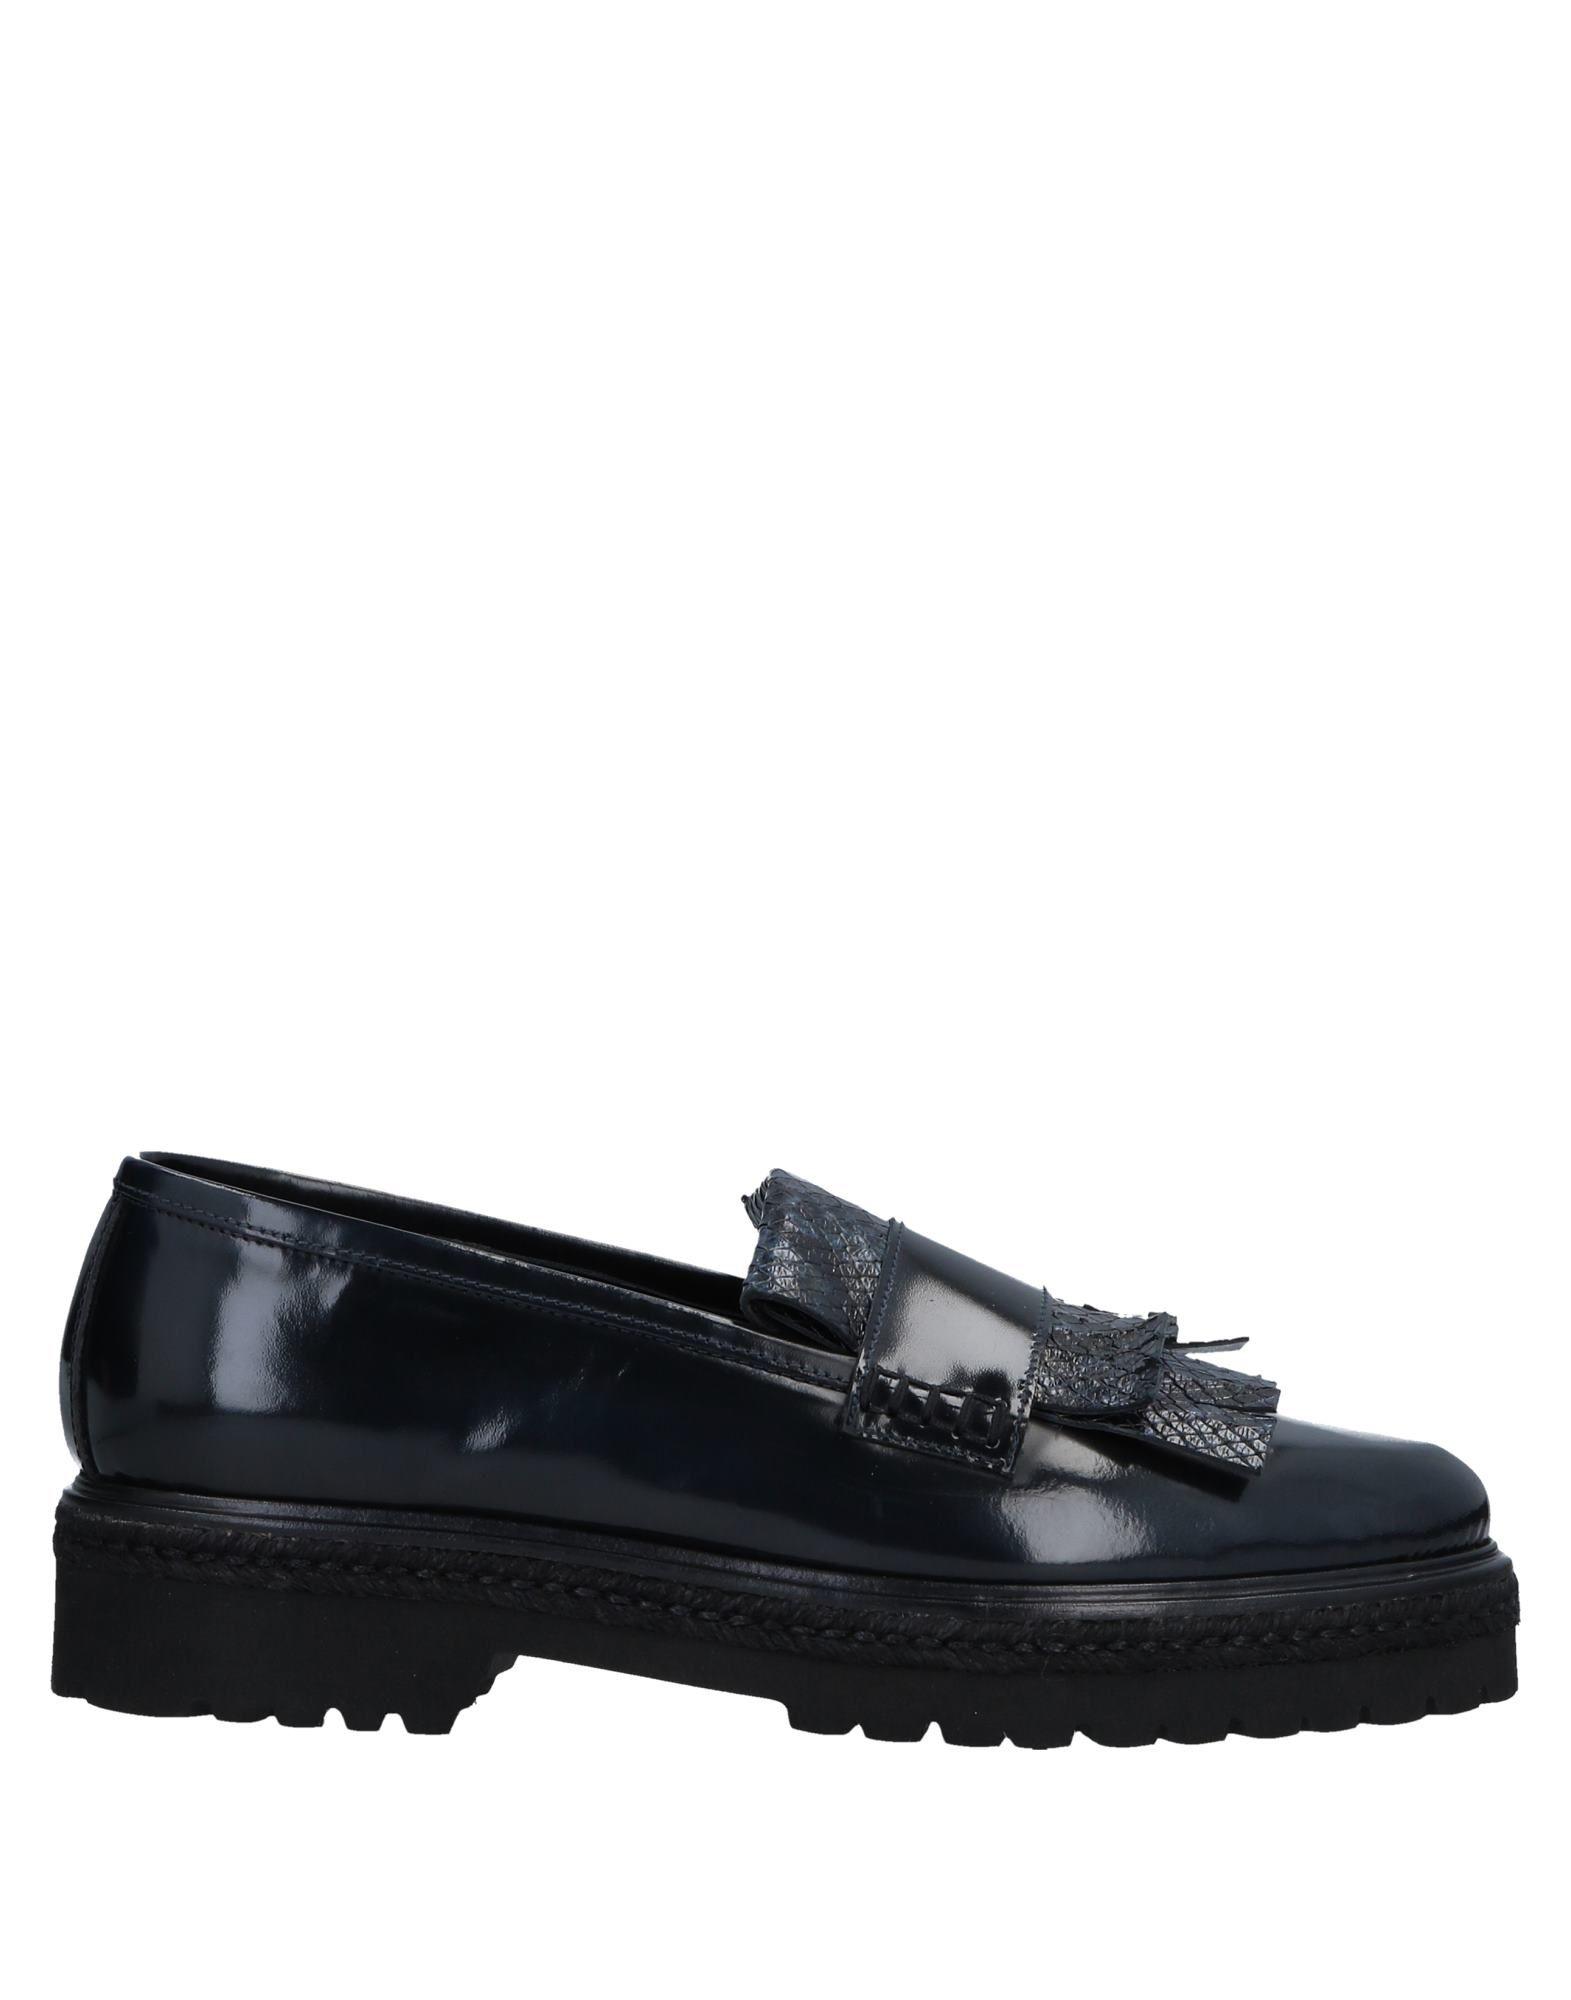 LOLO Loafers in Dark Blue